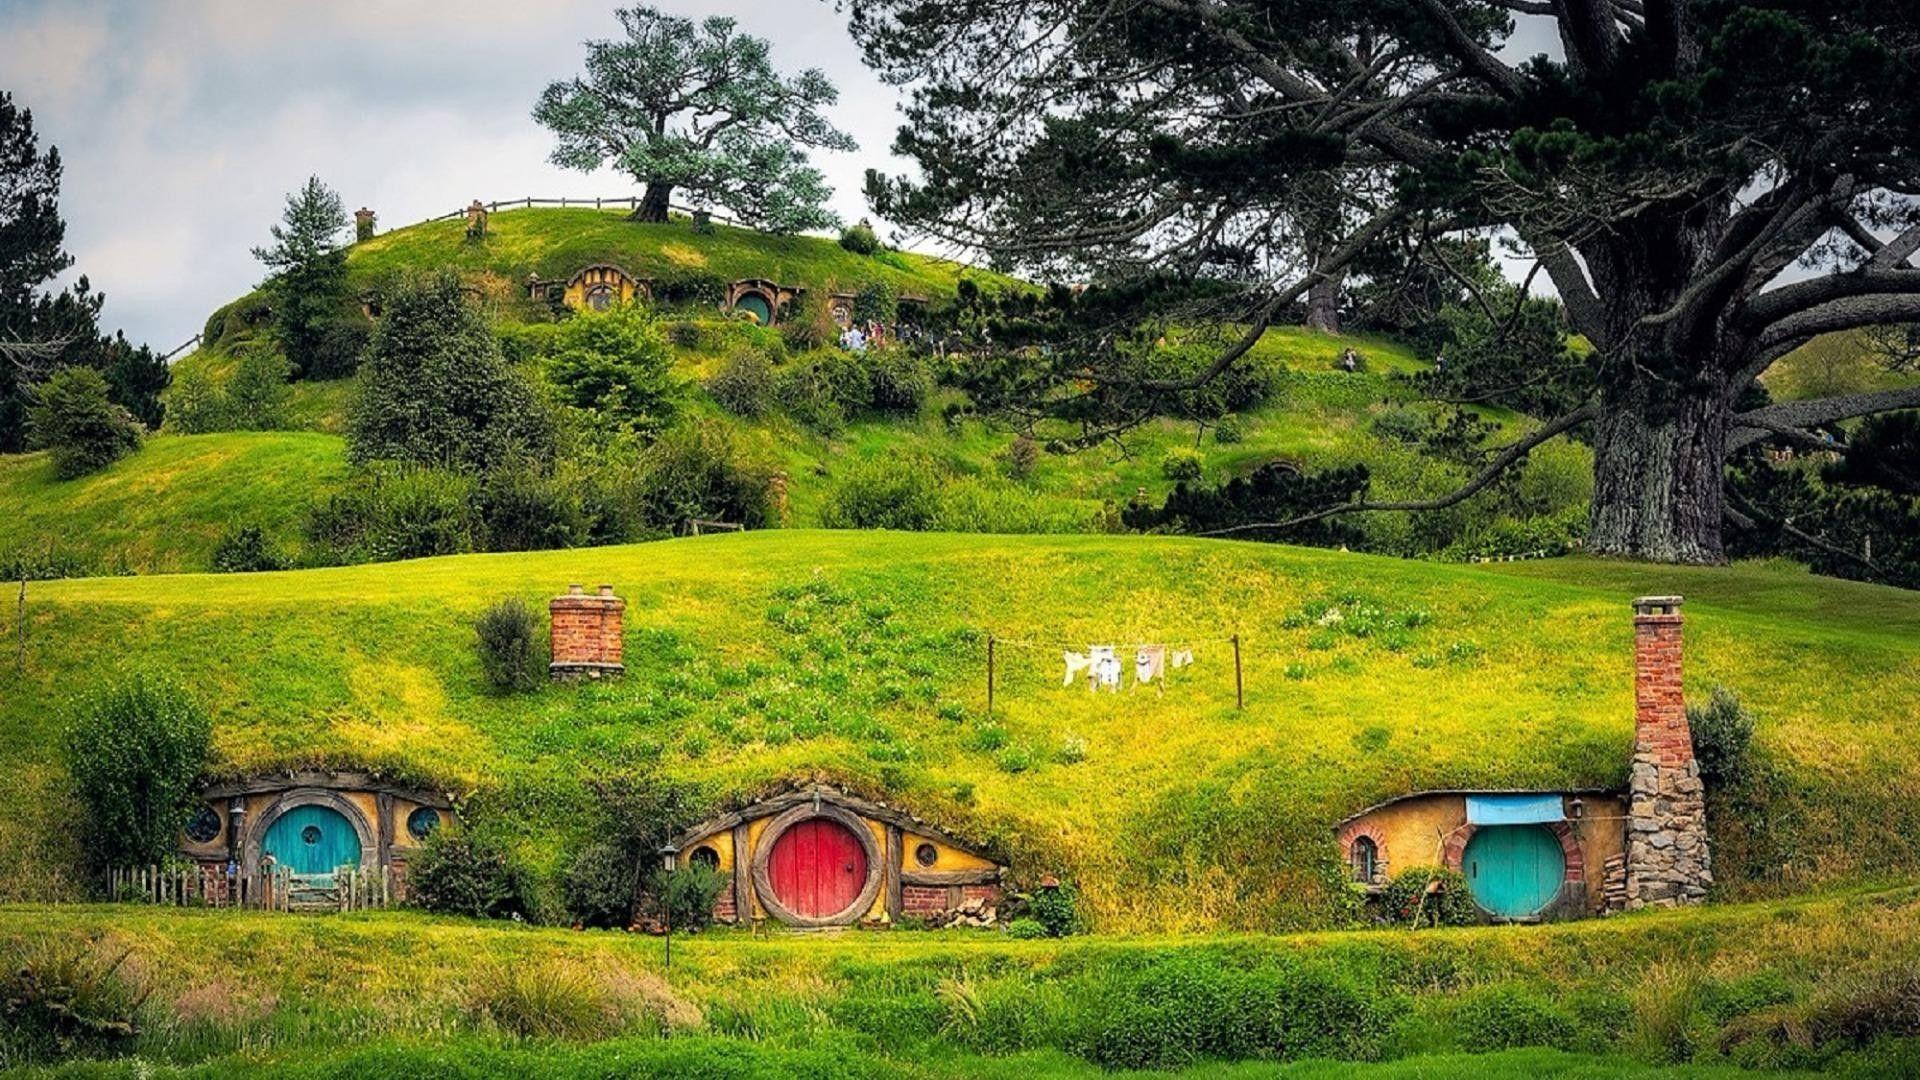 Hobbiton Wallpapers Top Free Hobbiton Backgrounds Wallpaperaccess